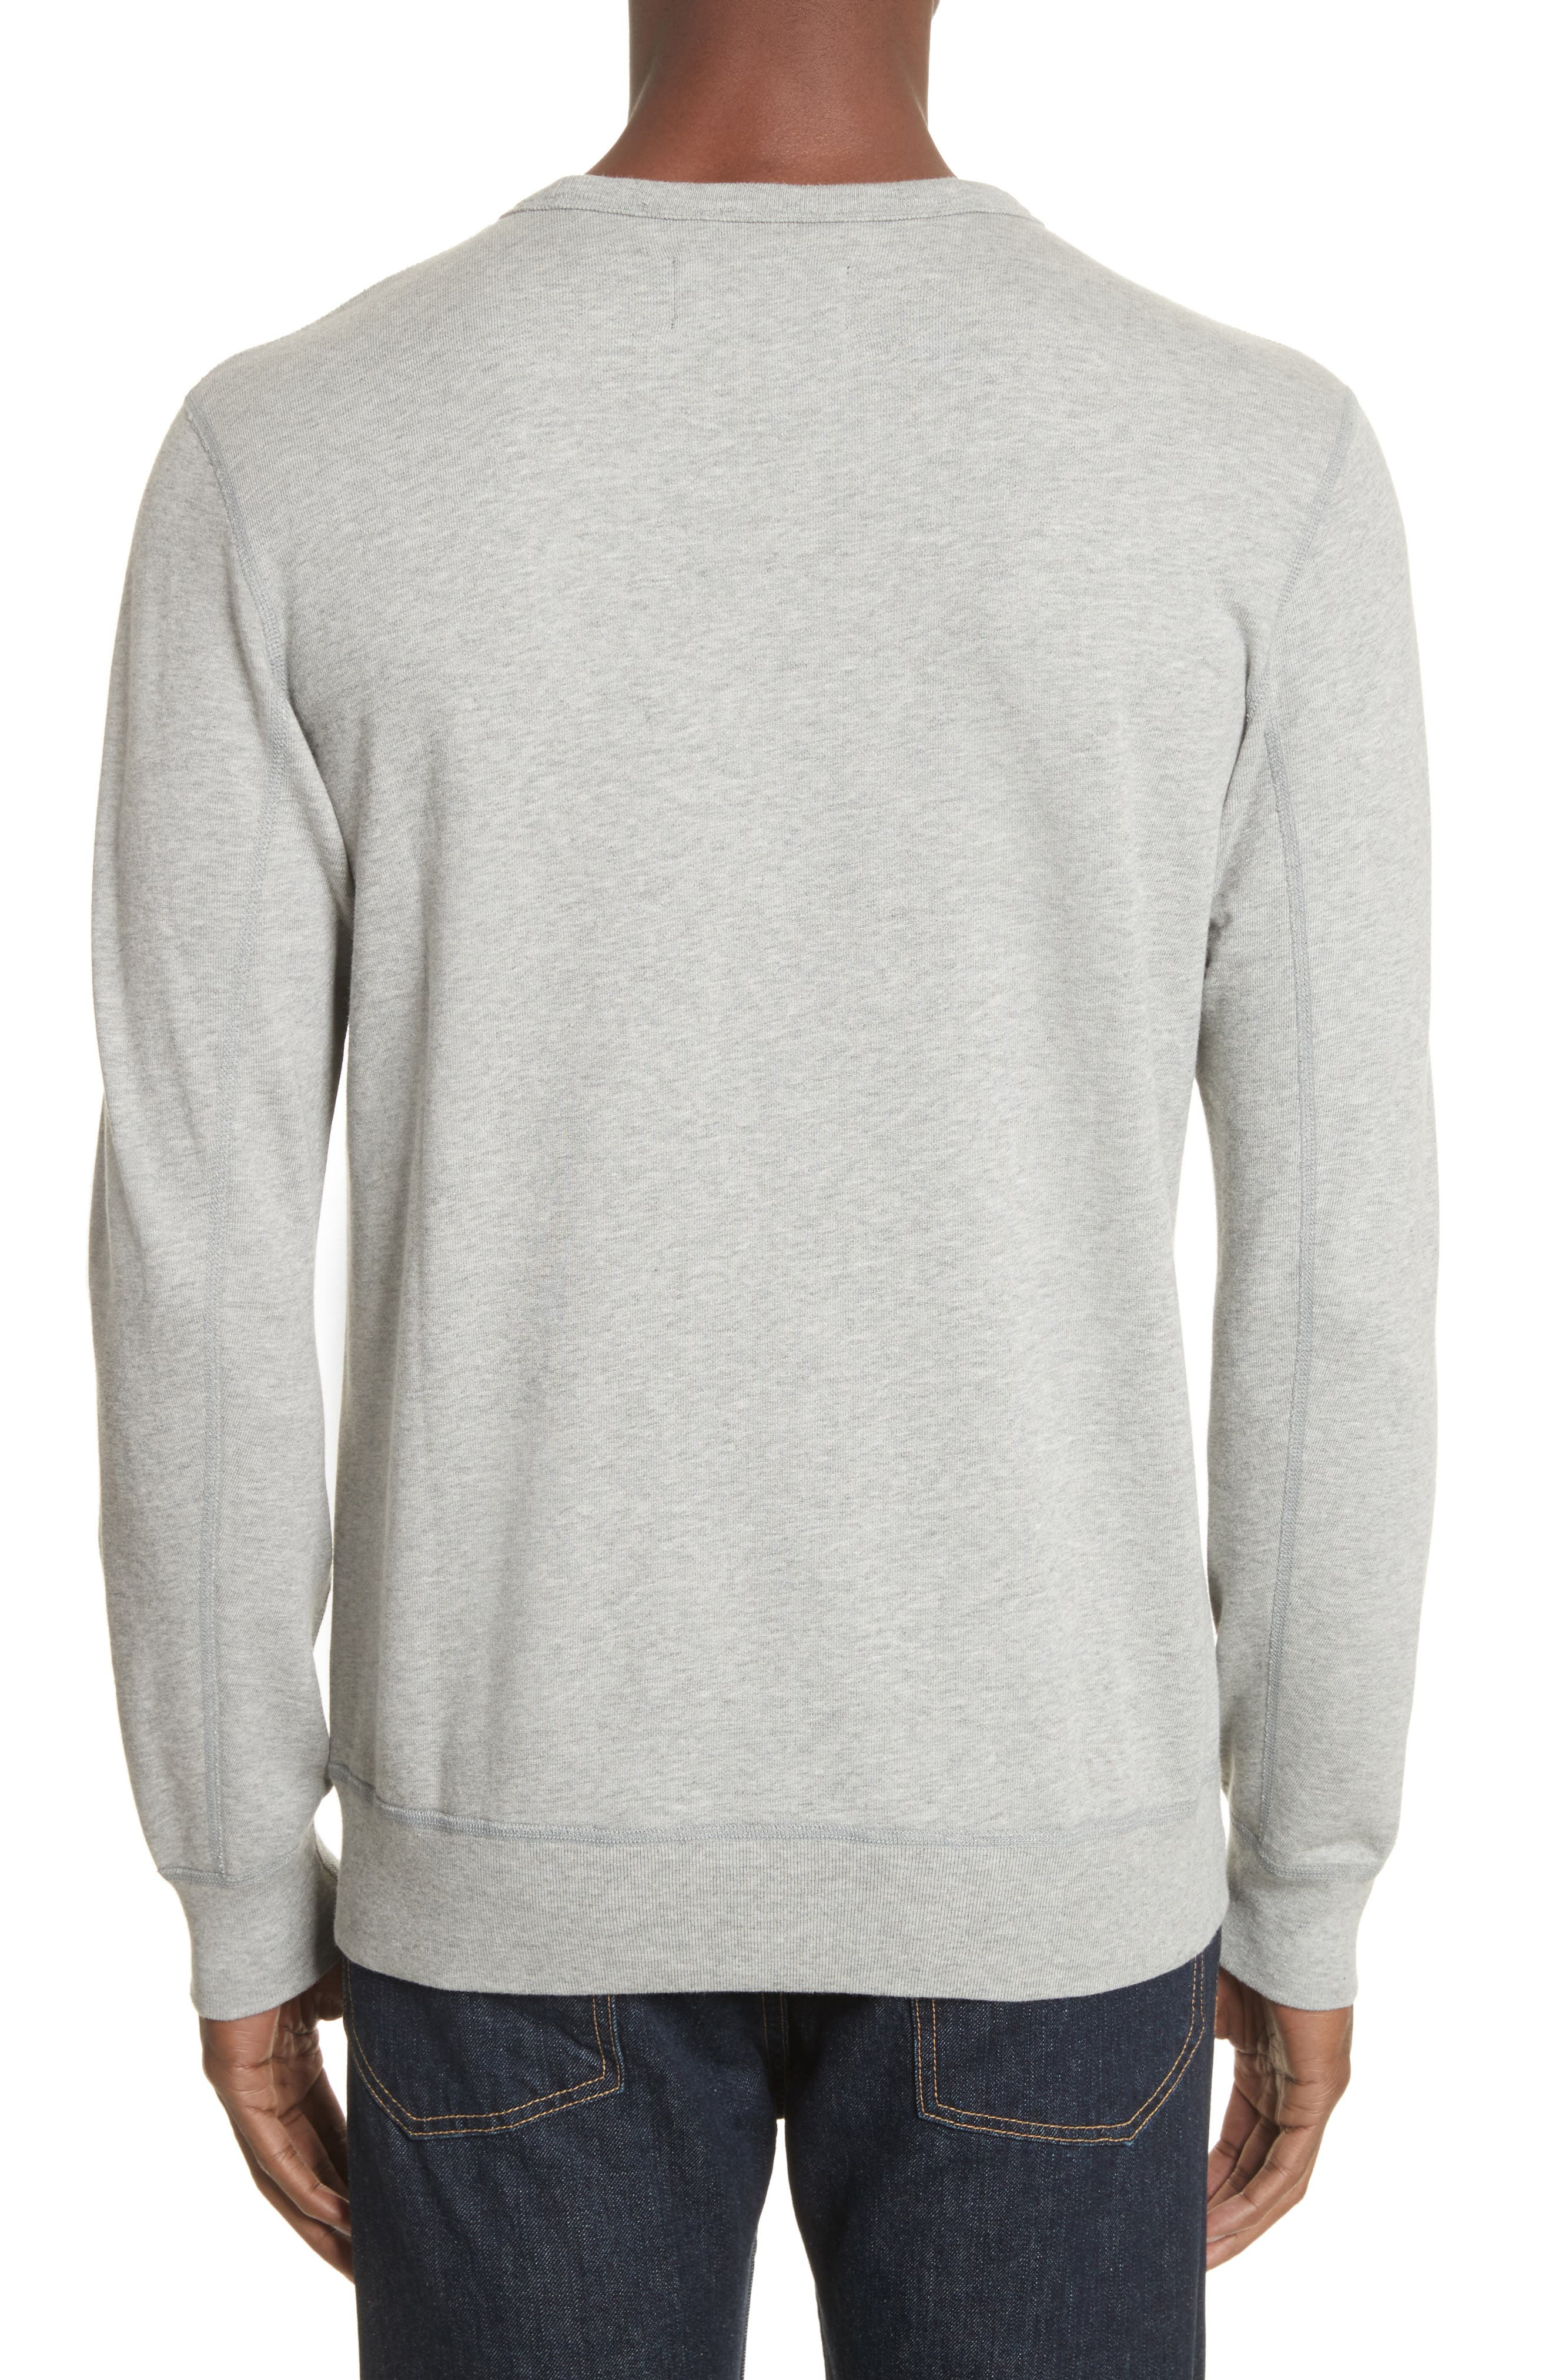 Crewneck Sweatshirt,                             Alternate thumbnail 2, color,                             060